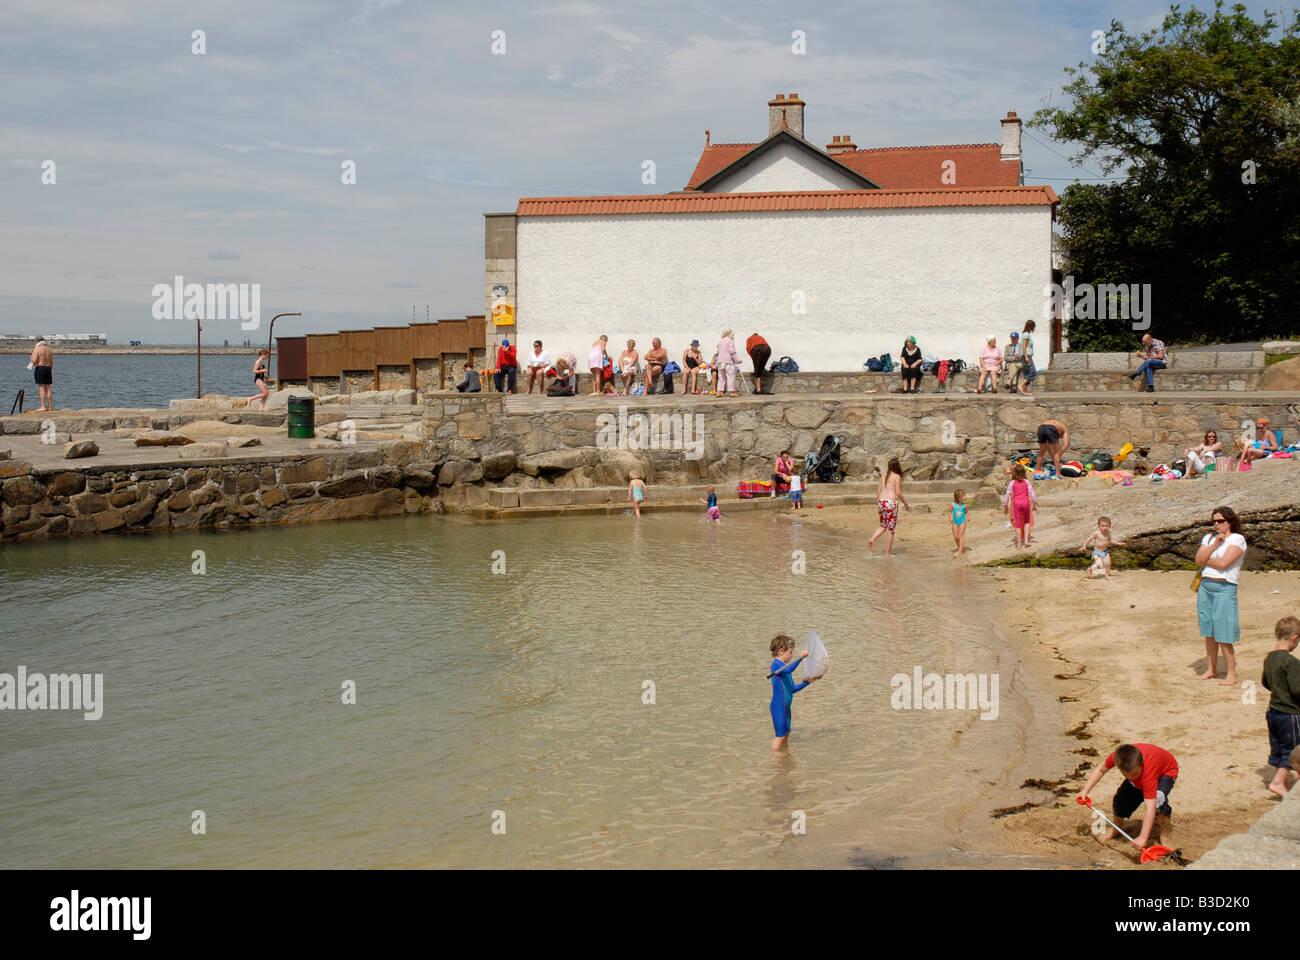 Sandycove Beach Irish sea Co Dublin Ireland - Stock Image